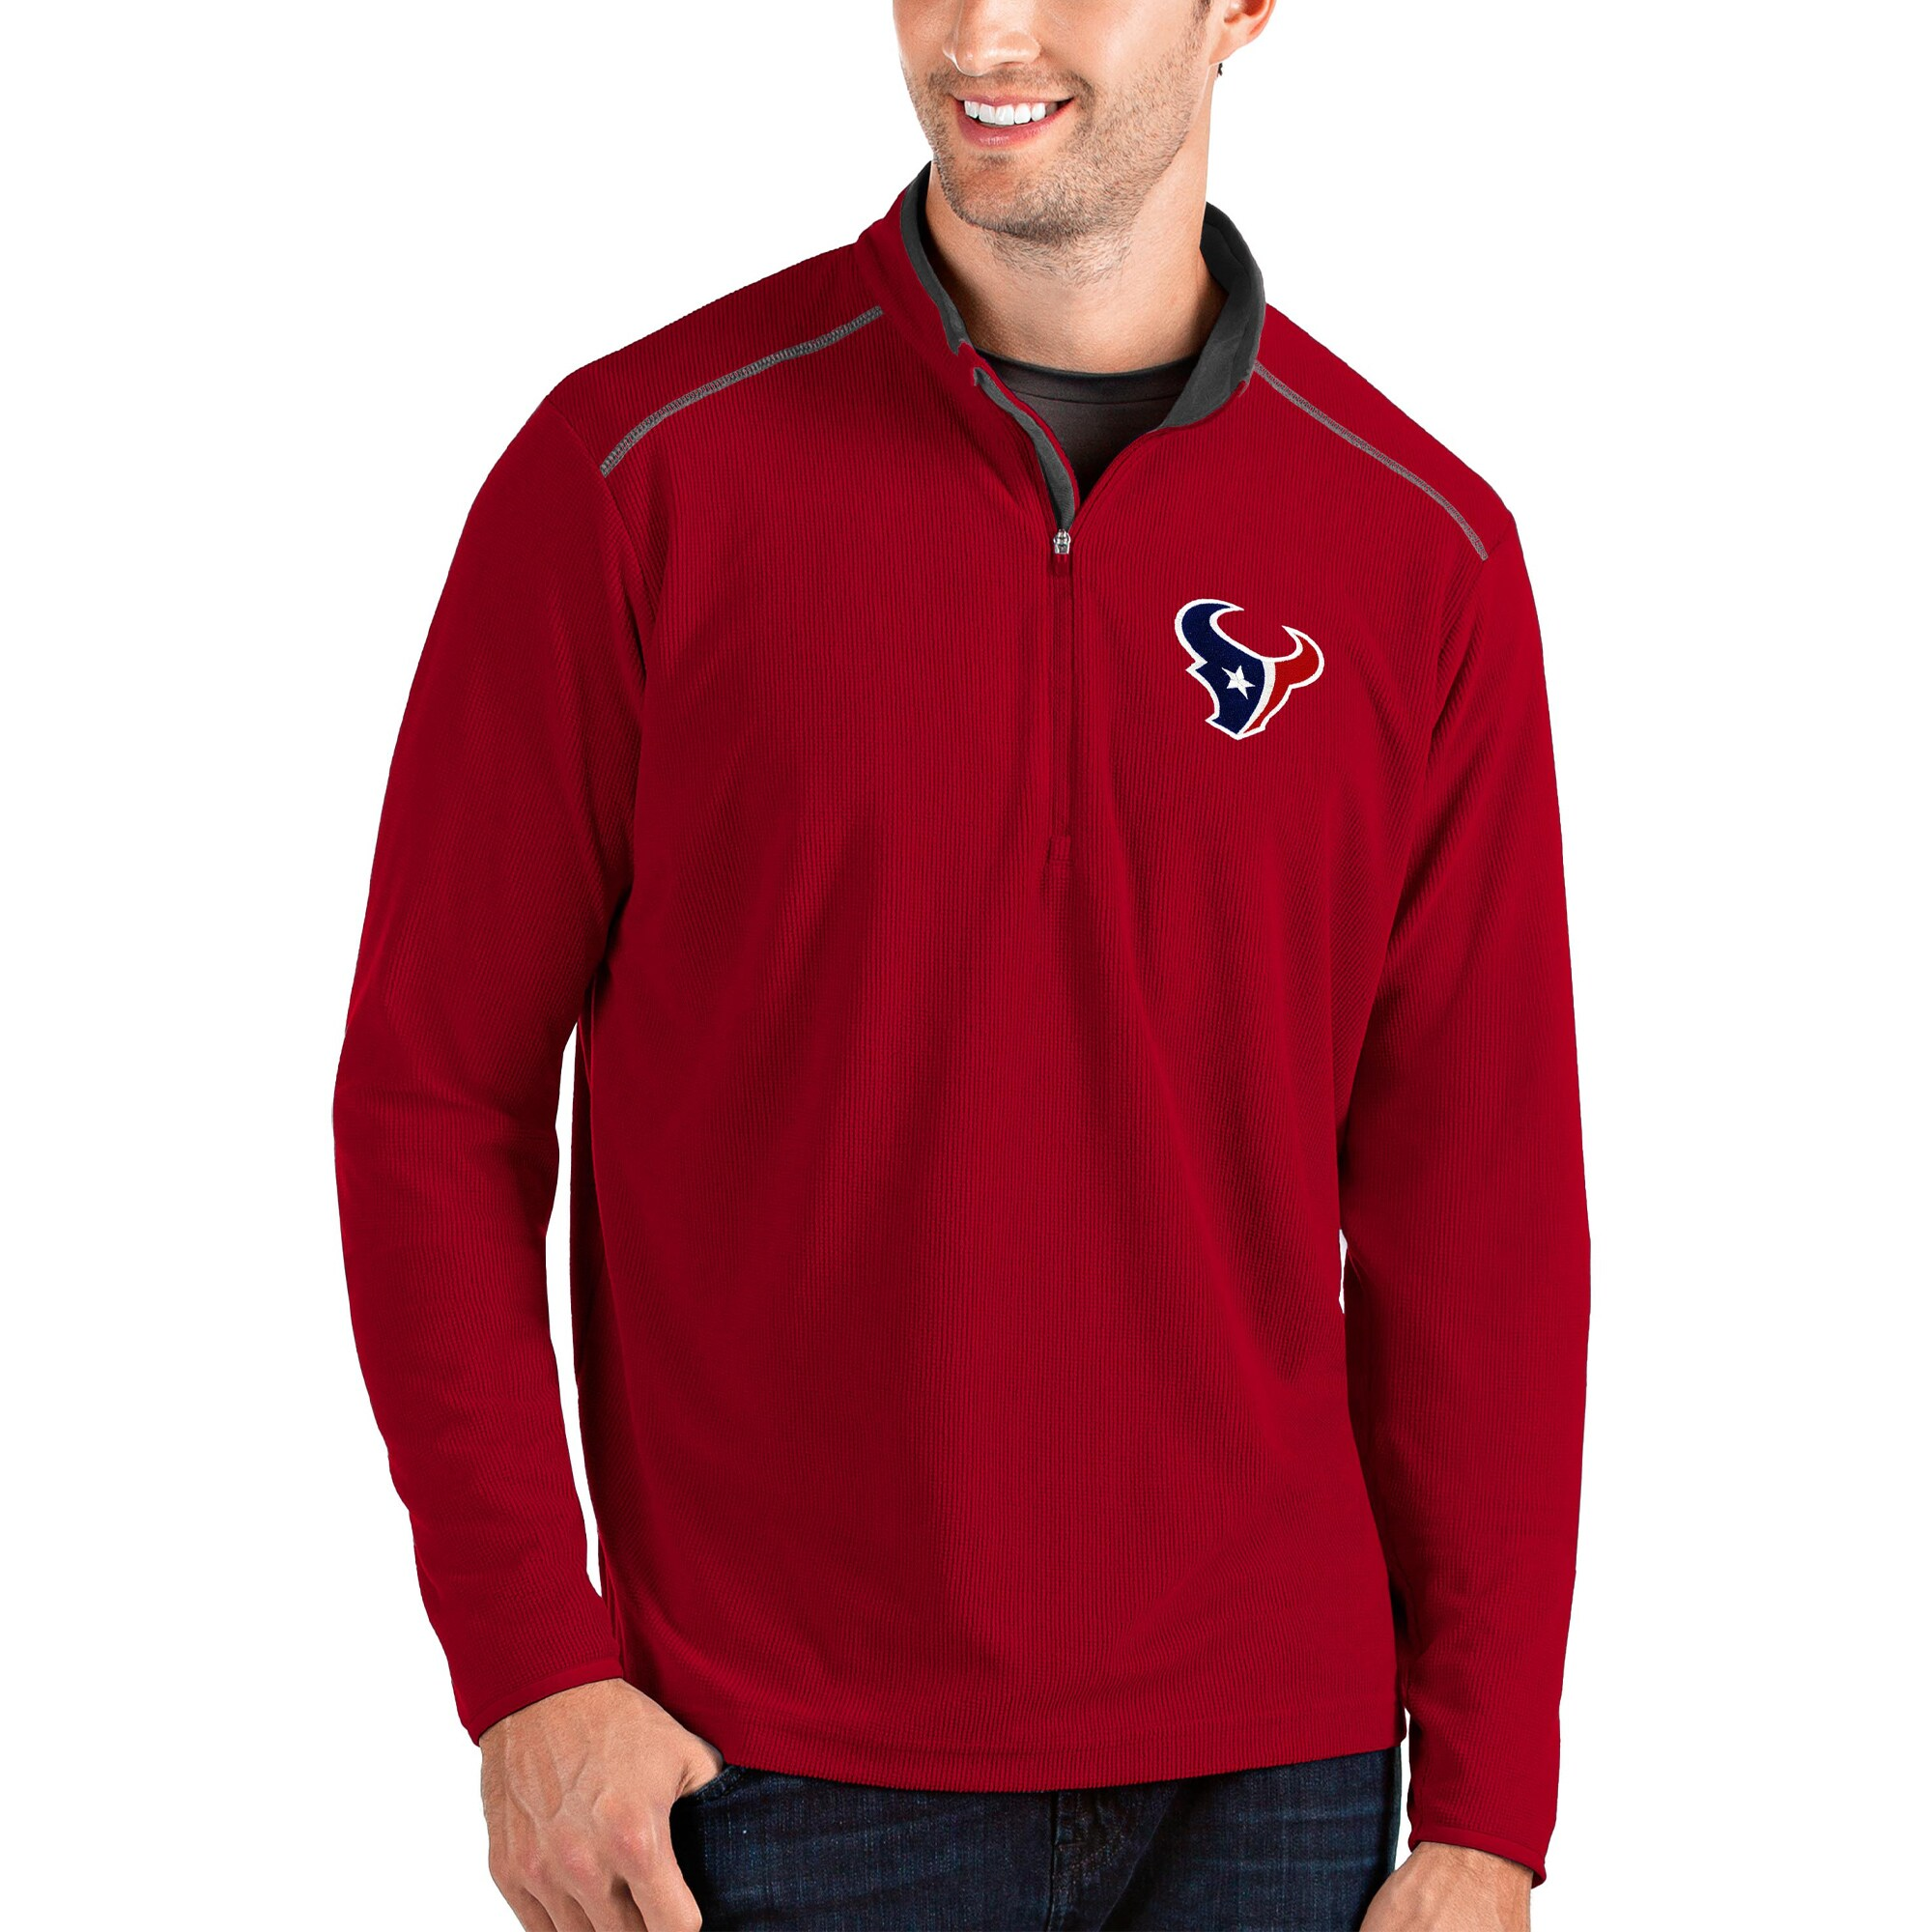 Houston Texans Antigua Glacier Quarter-Zip Pullover Jacket - Red/Gray